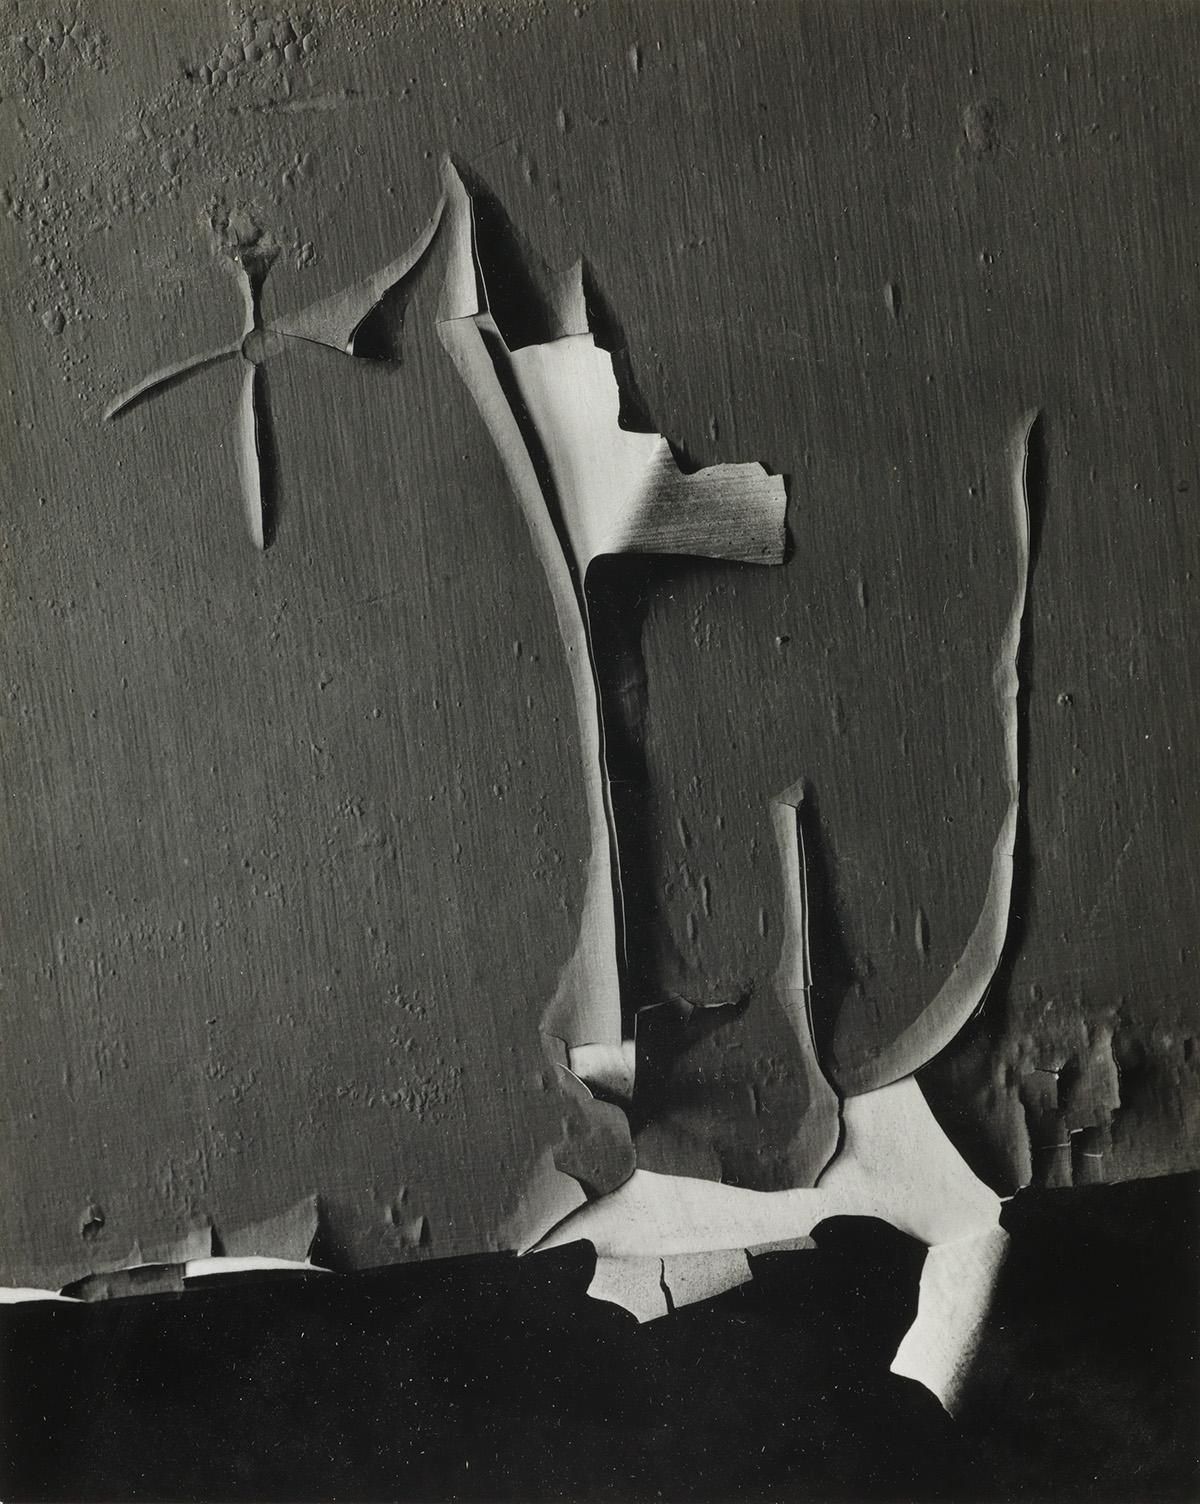 MINOR WHITE (1908-1976) Peeled Paint, Rochester, New York.